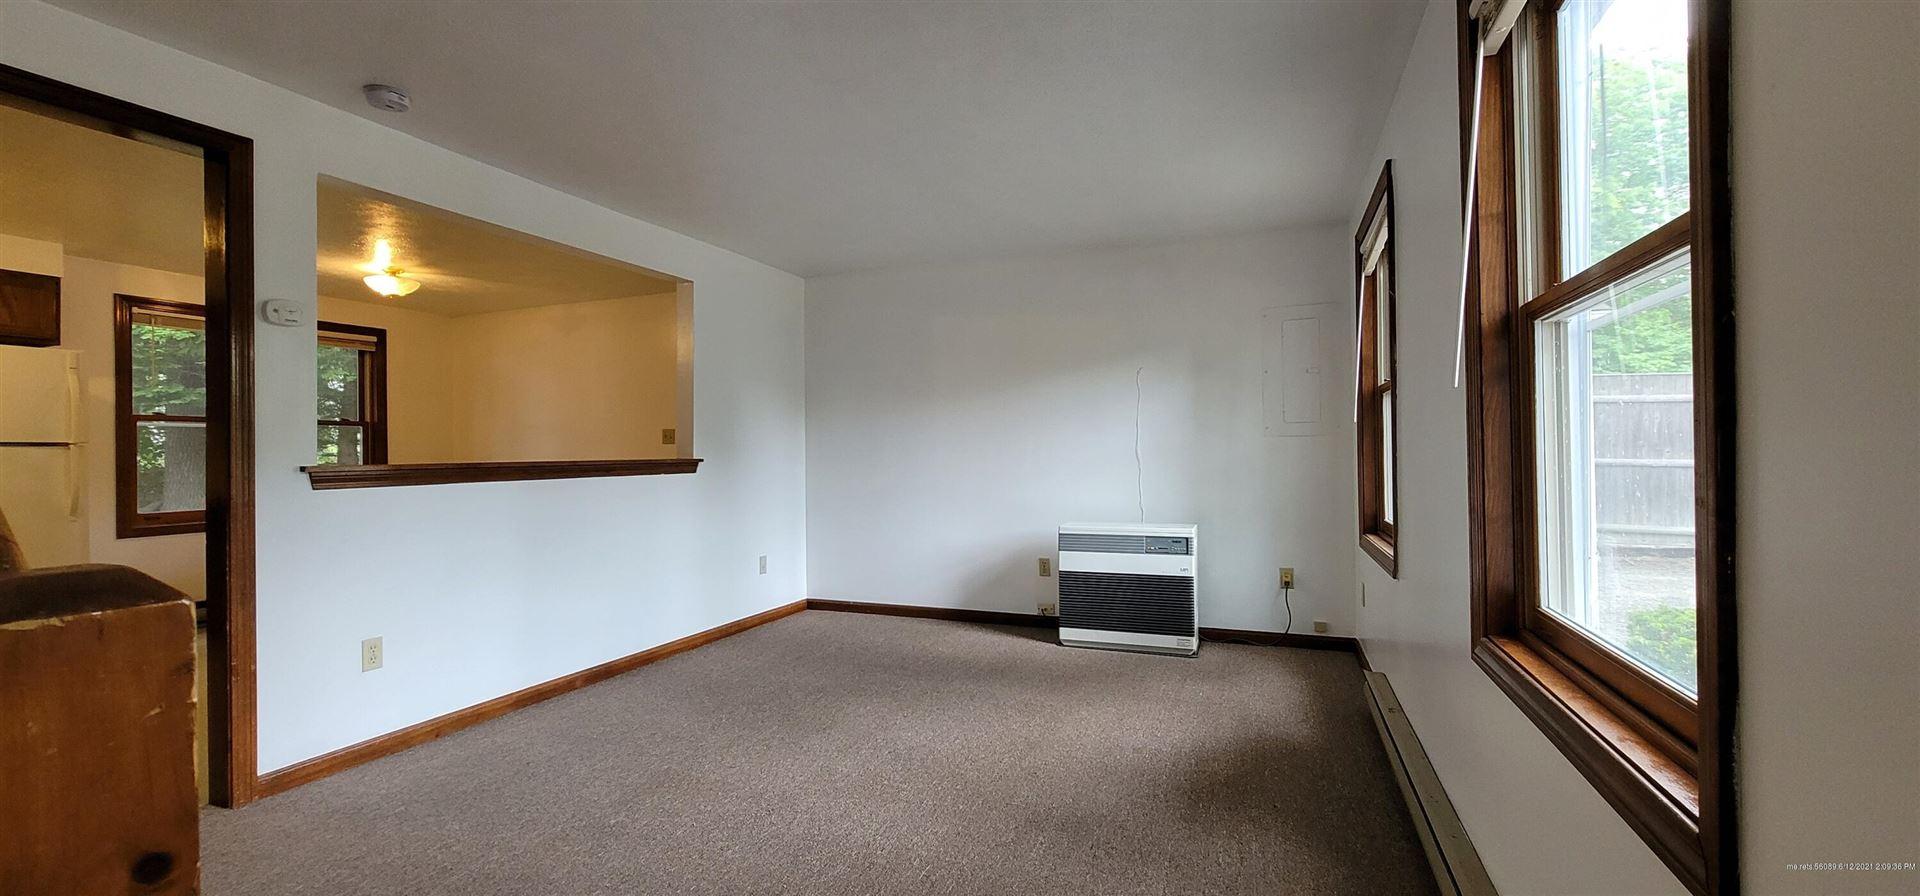 Photo of 8 Madison Street, Sanford, ME 04073 (MLS # 1495974)